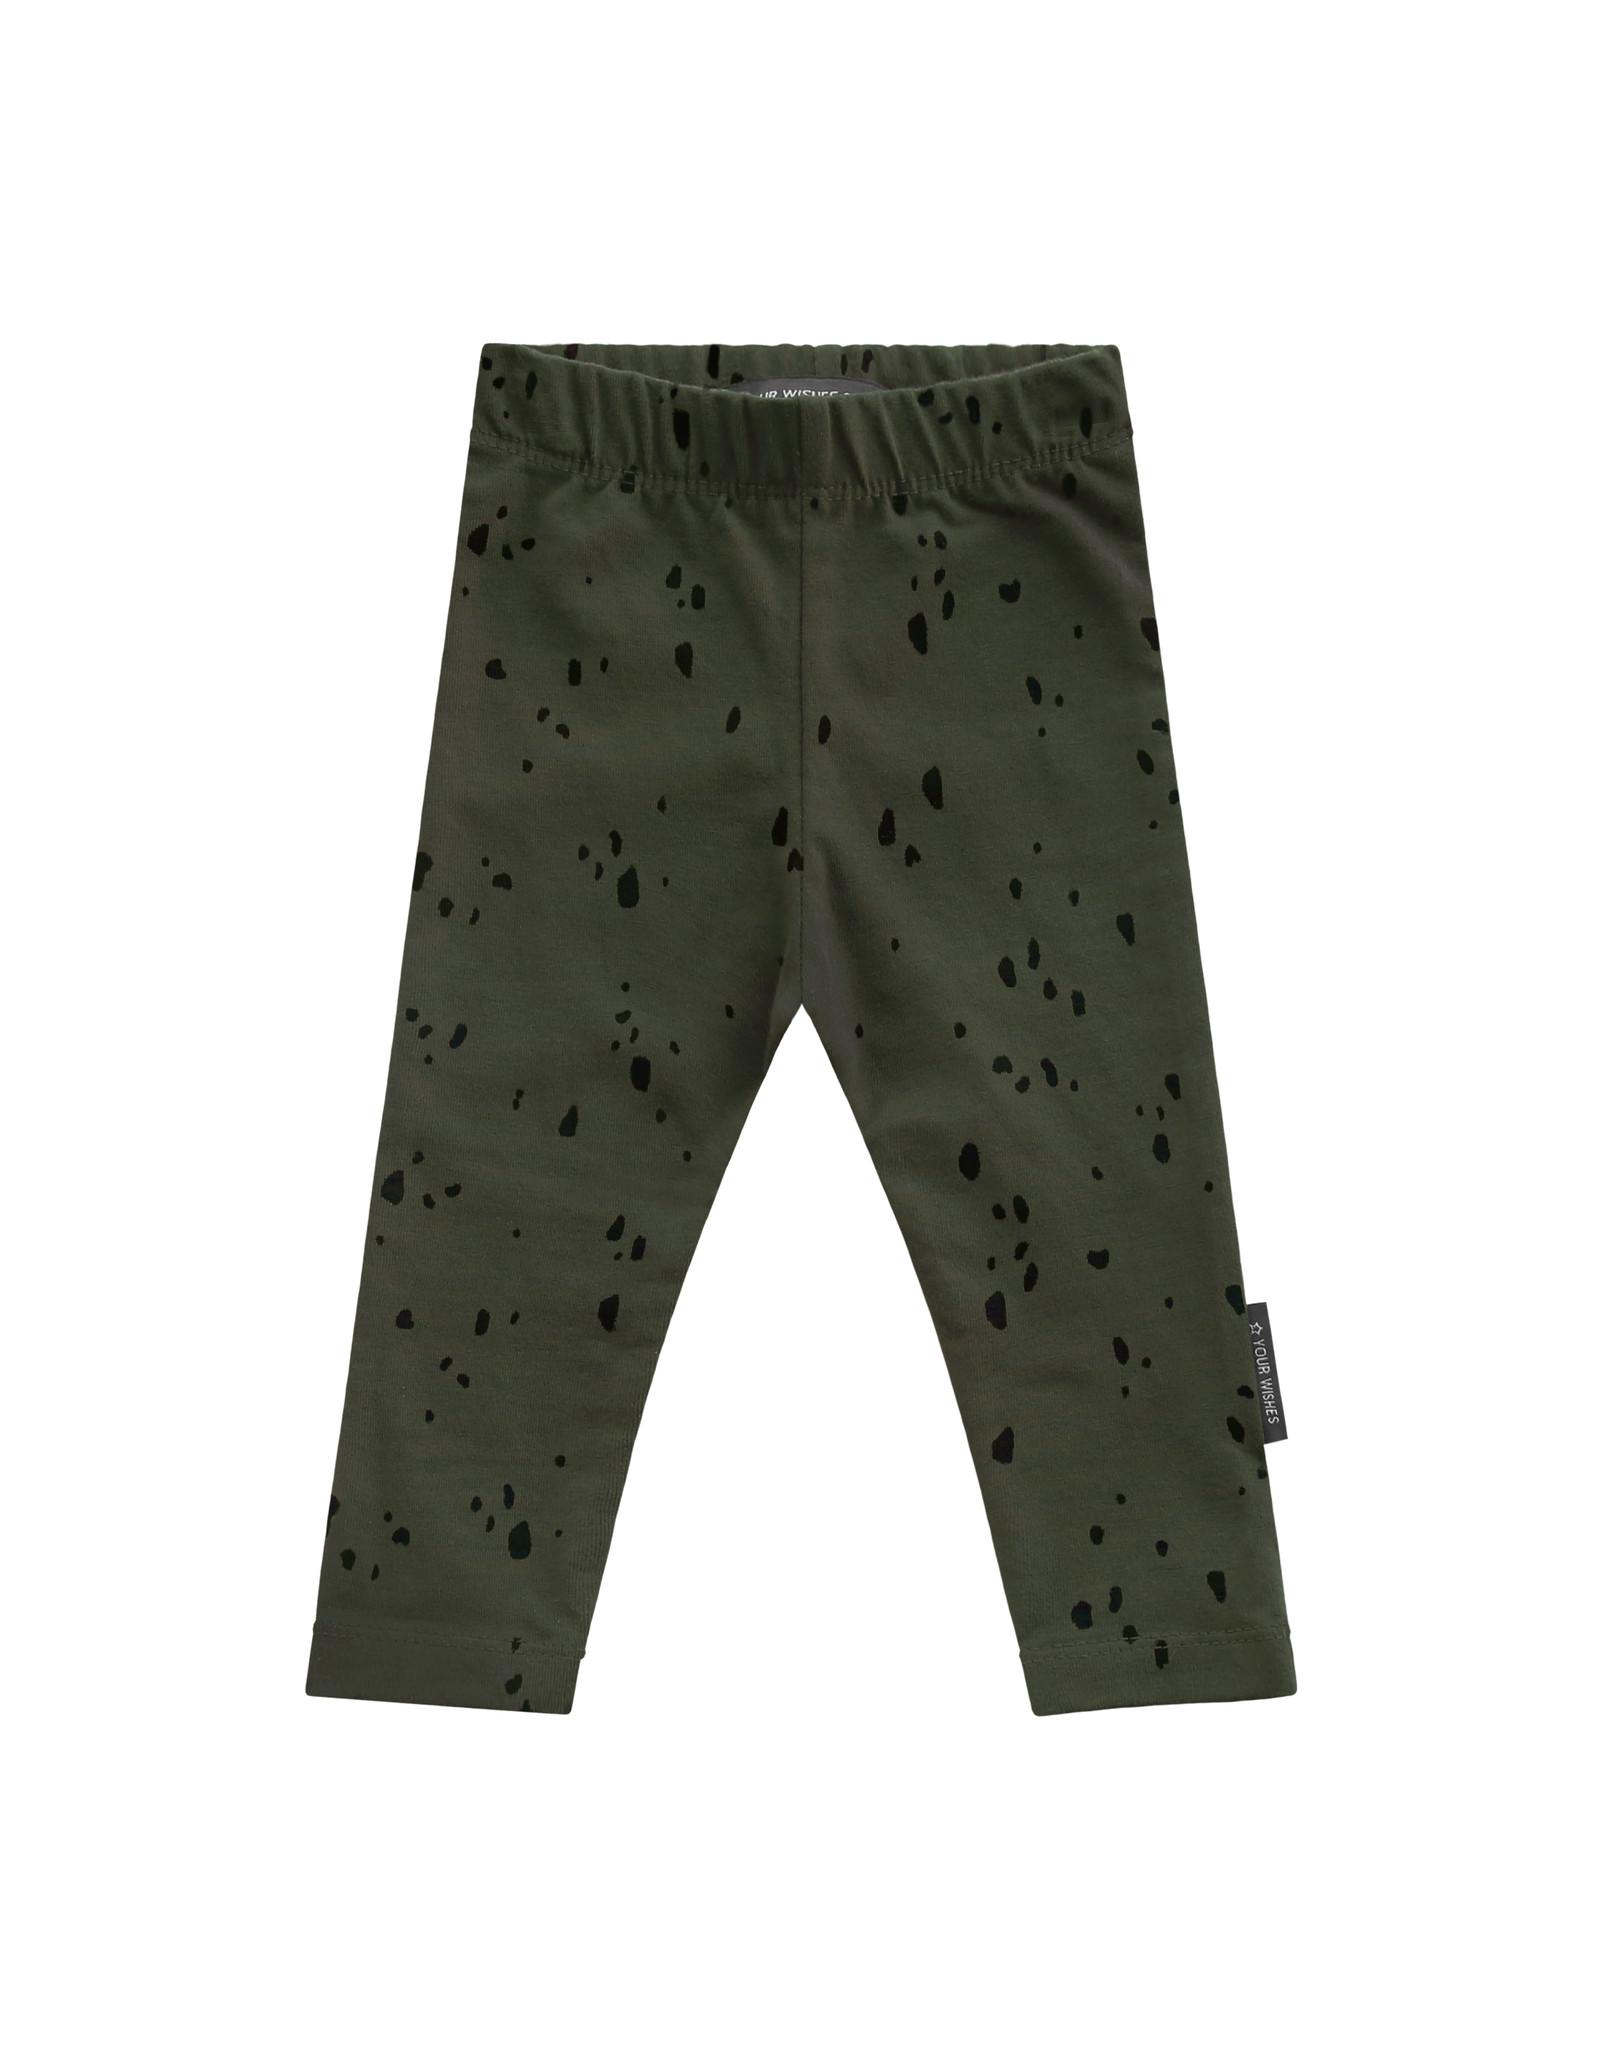 Your Wishes YW | Splatters | Legging | Desk Green